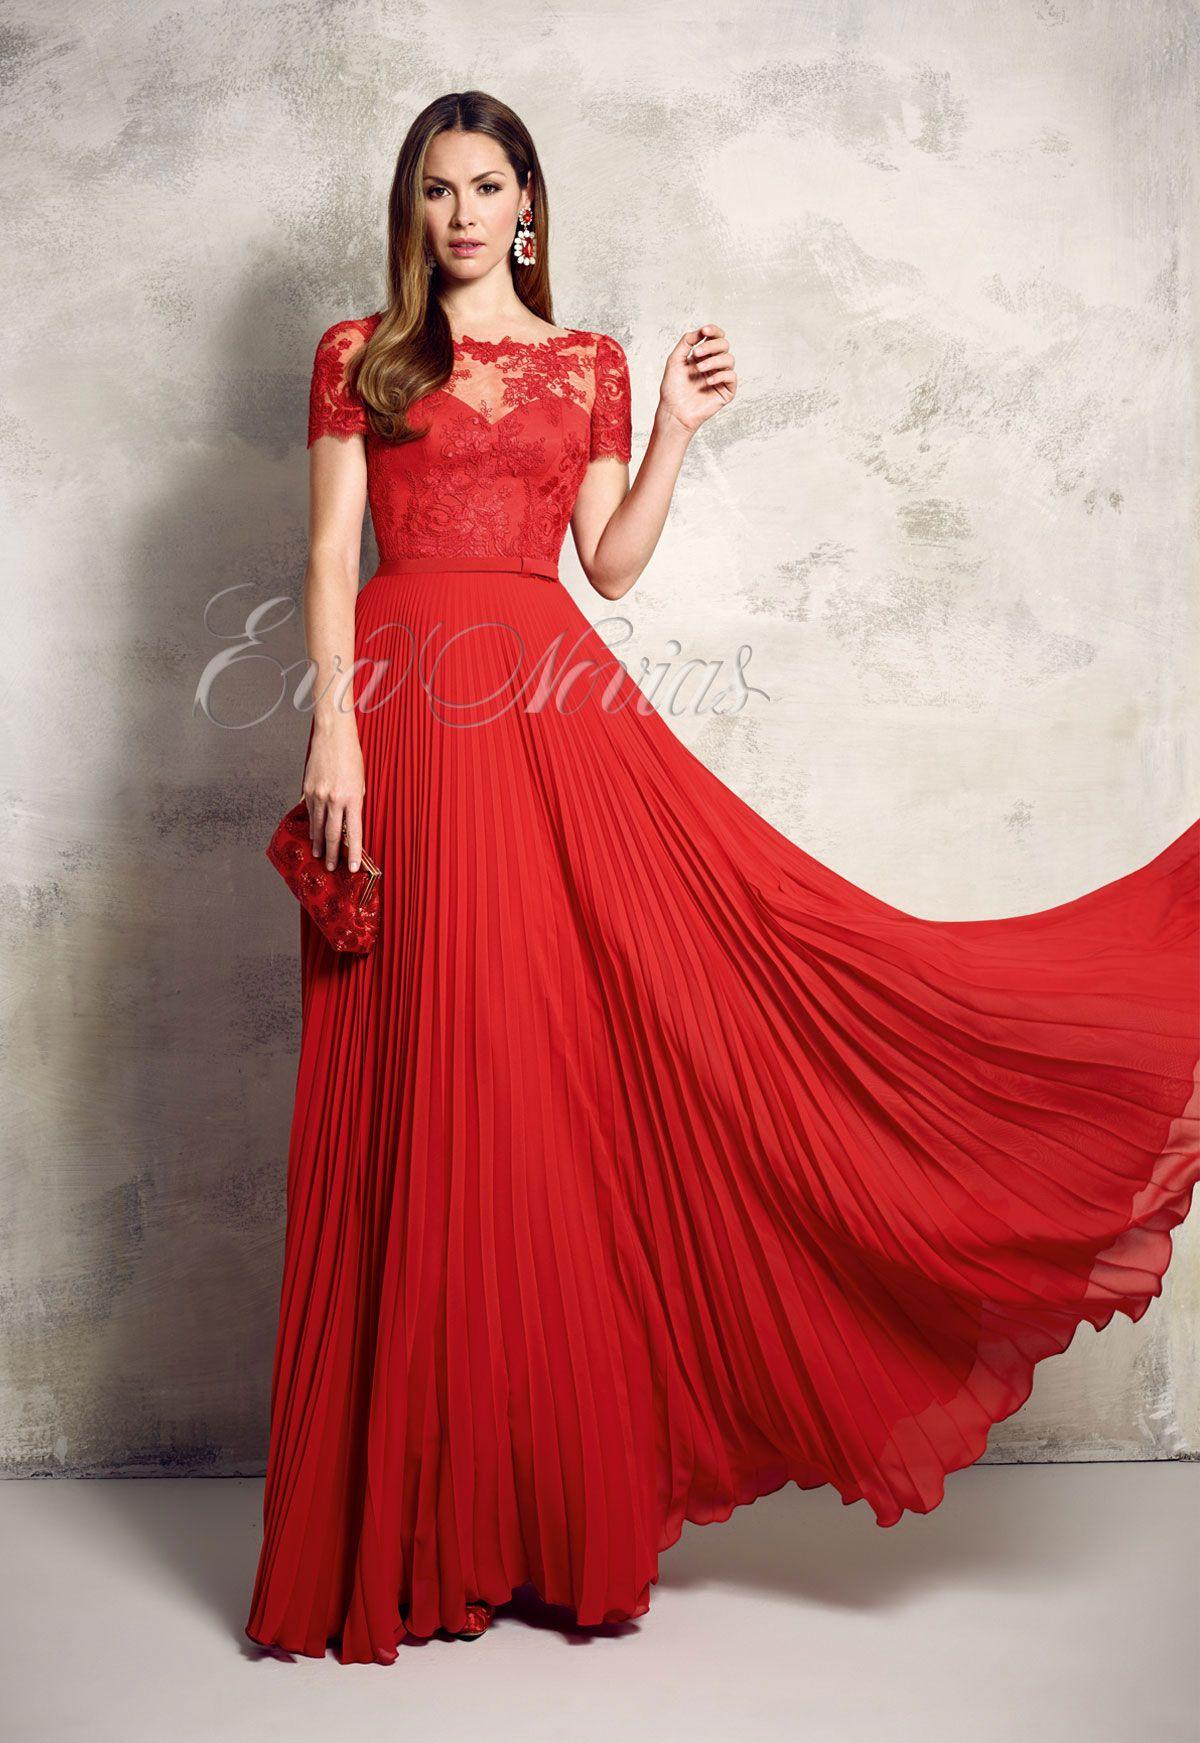 db4824423 Vestido de fiesta Pepe Botella 2016 Modelo 1117 en tienda de novias Madrid